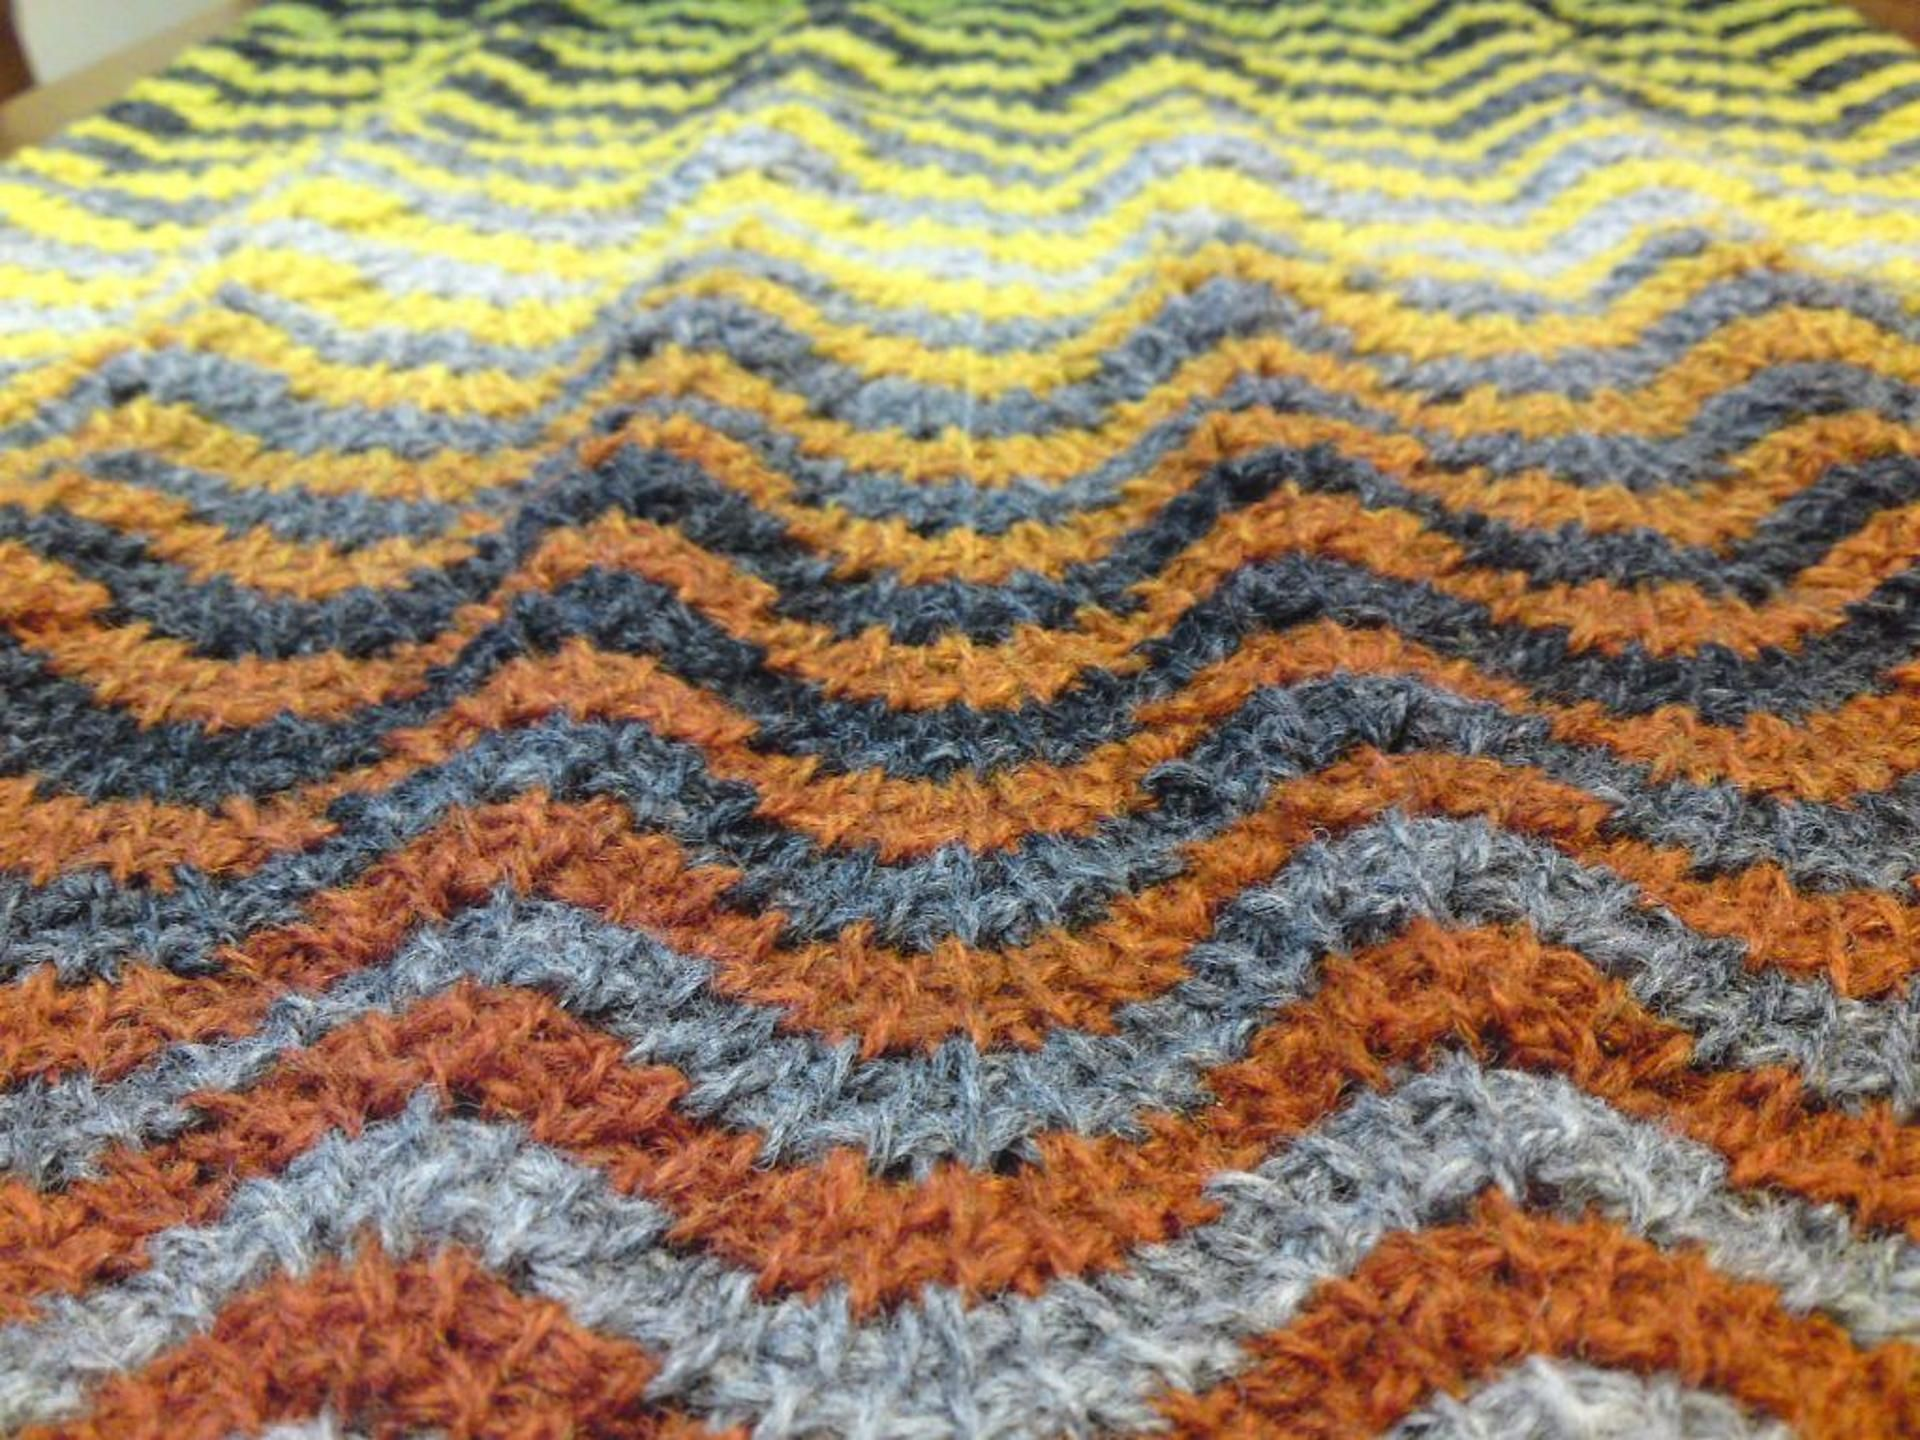 9 beginner tunisian crochet patterns for practice scarf crochet 9 beginner tunisian crochet patterns for practice bankloansurffo Gallery